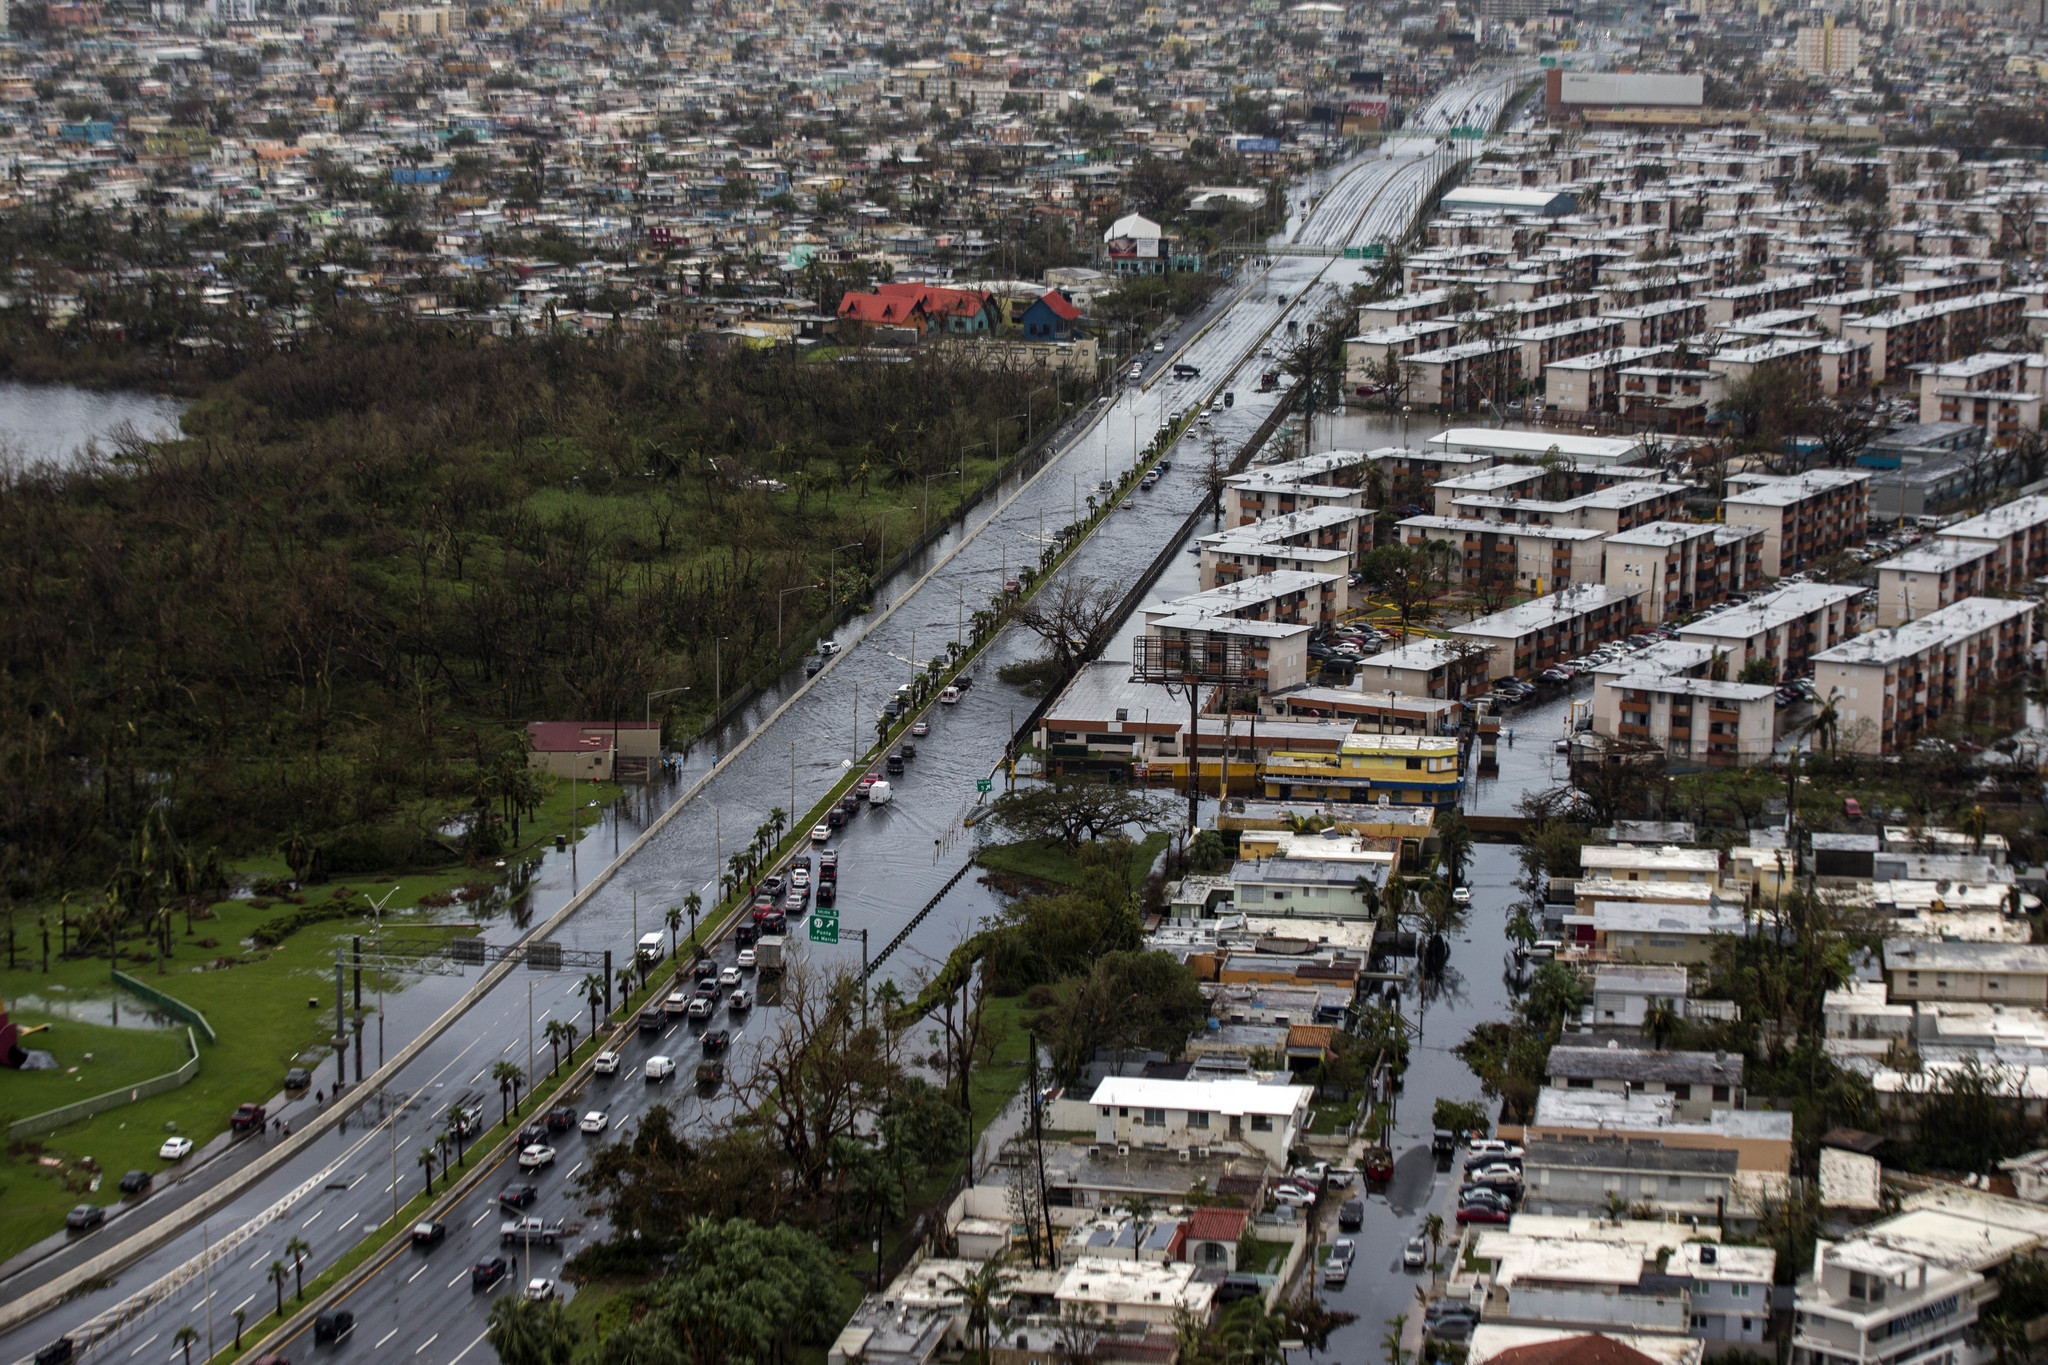 No water, fuel, power, phones: Puerto Rico faces a growing humanitarian crisis in Maria's aftermath